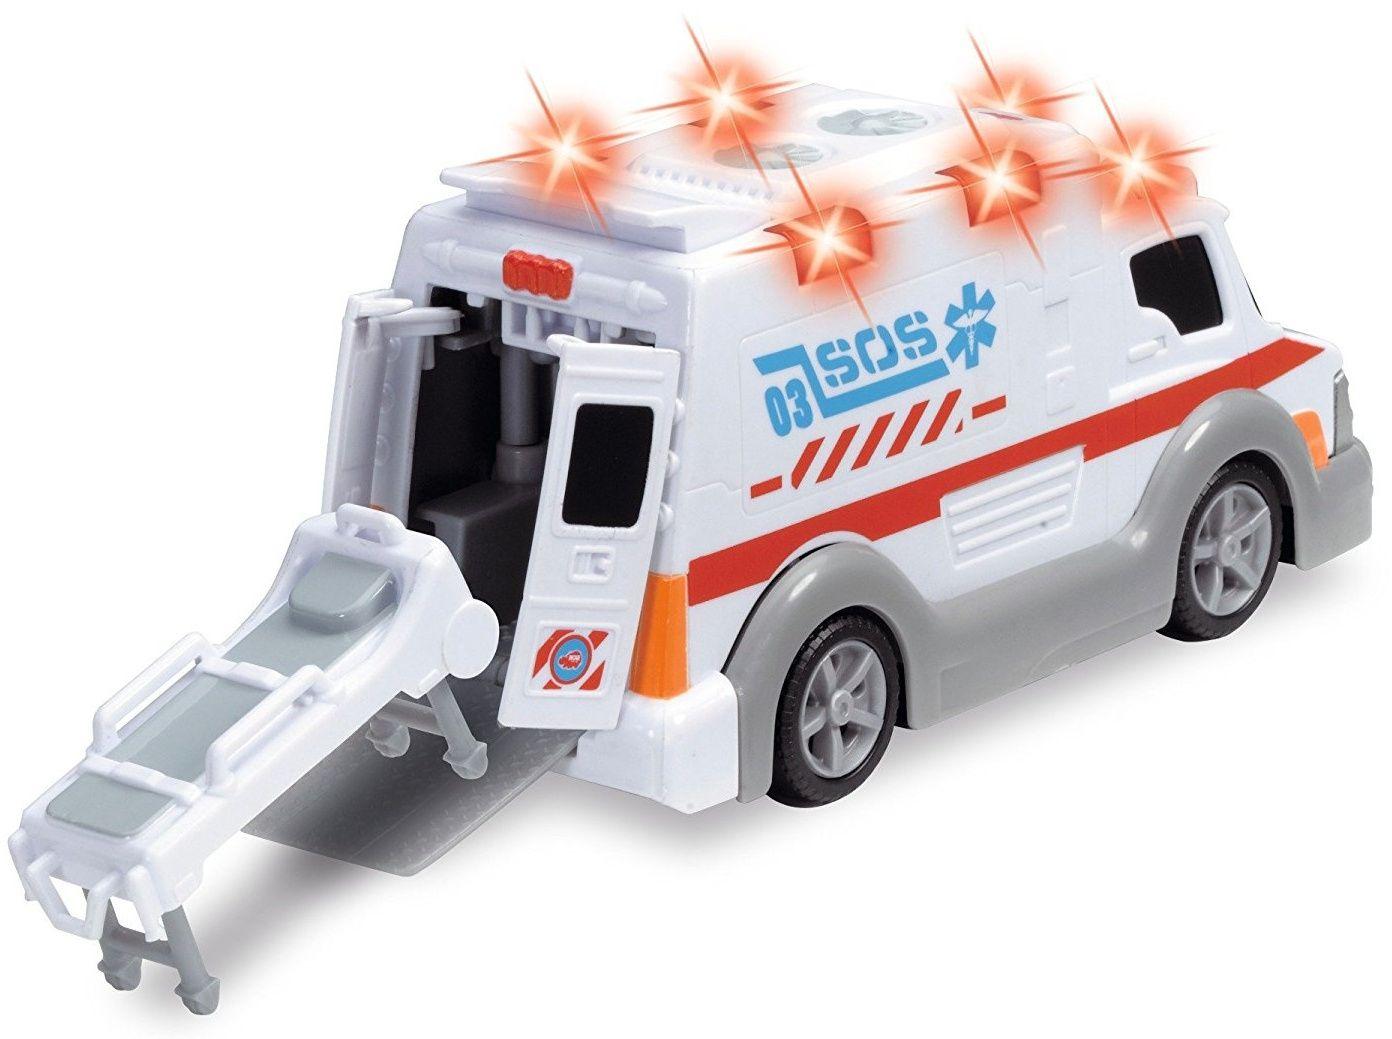 Линейка Dickie Toys - Action Series - 2